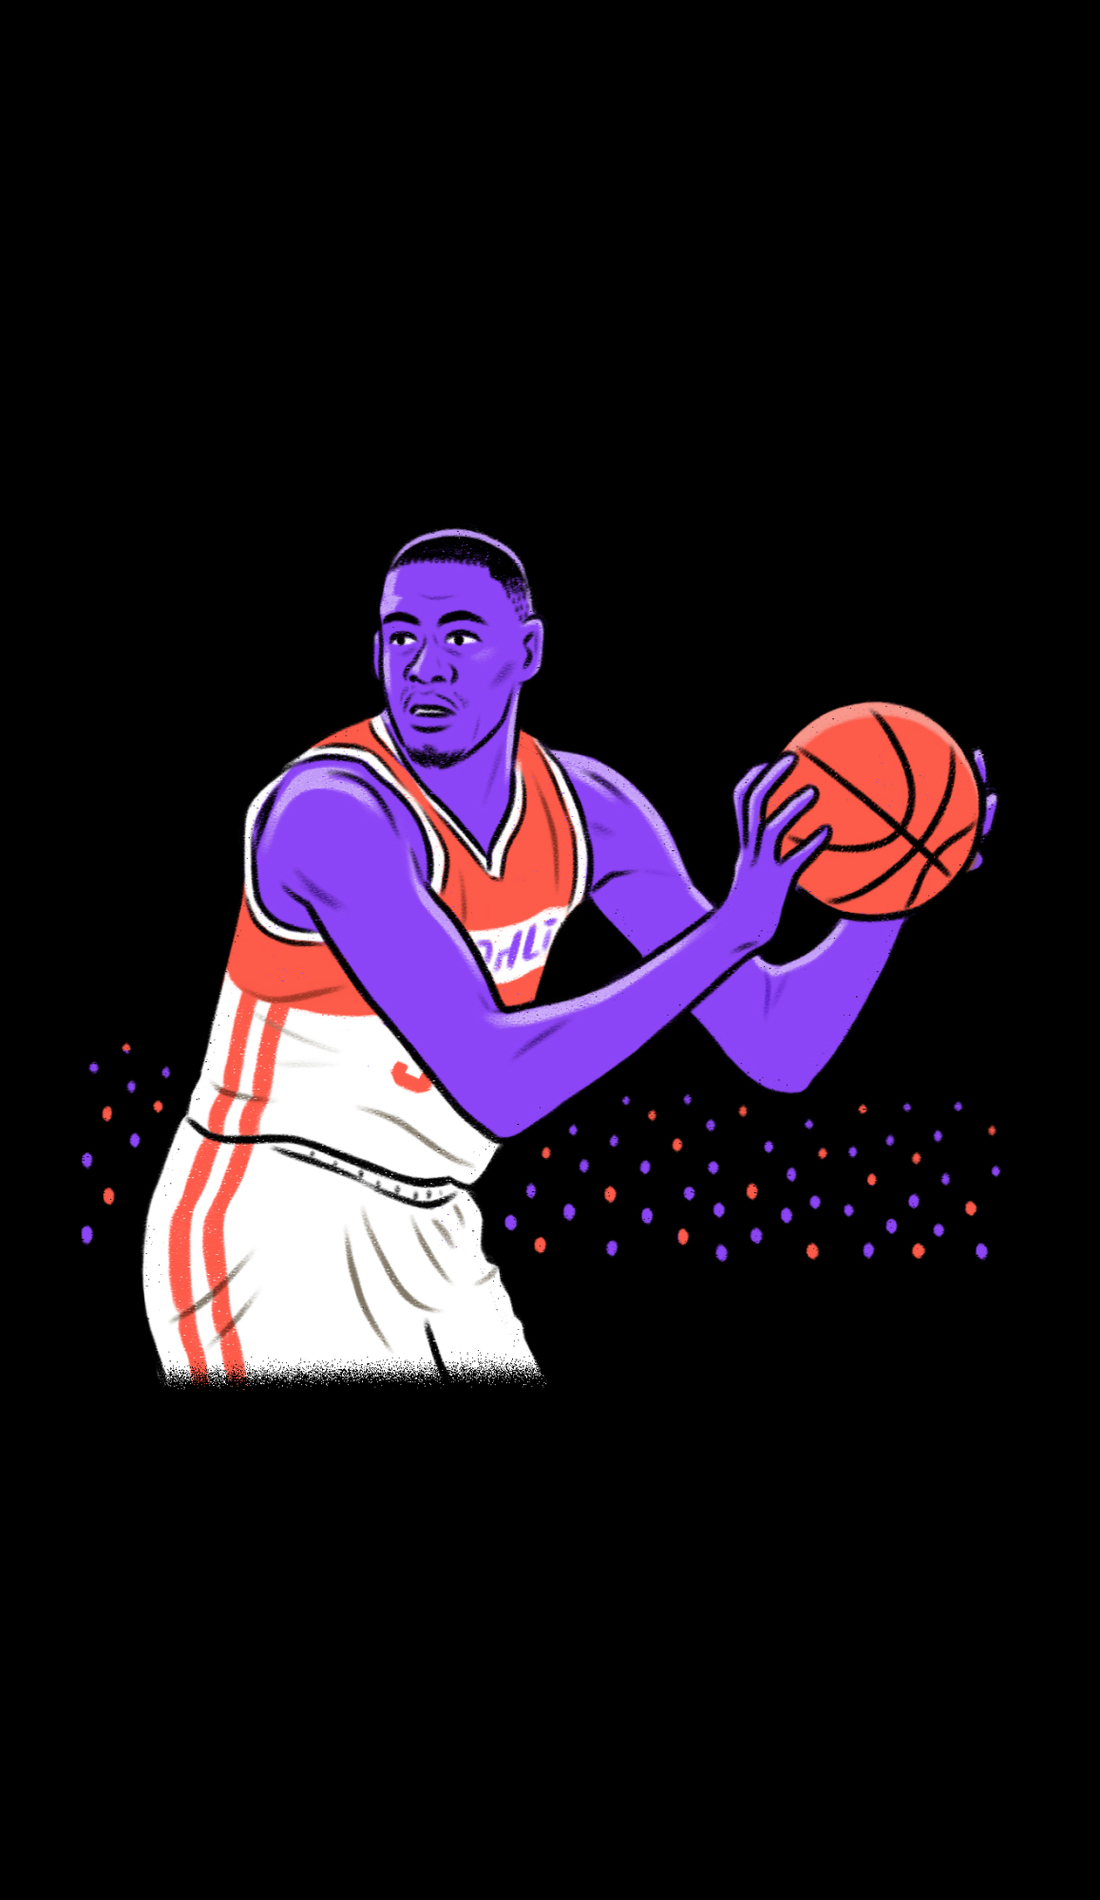 A Princeton Tigers Basketball live event